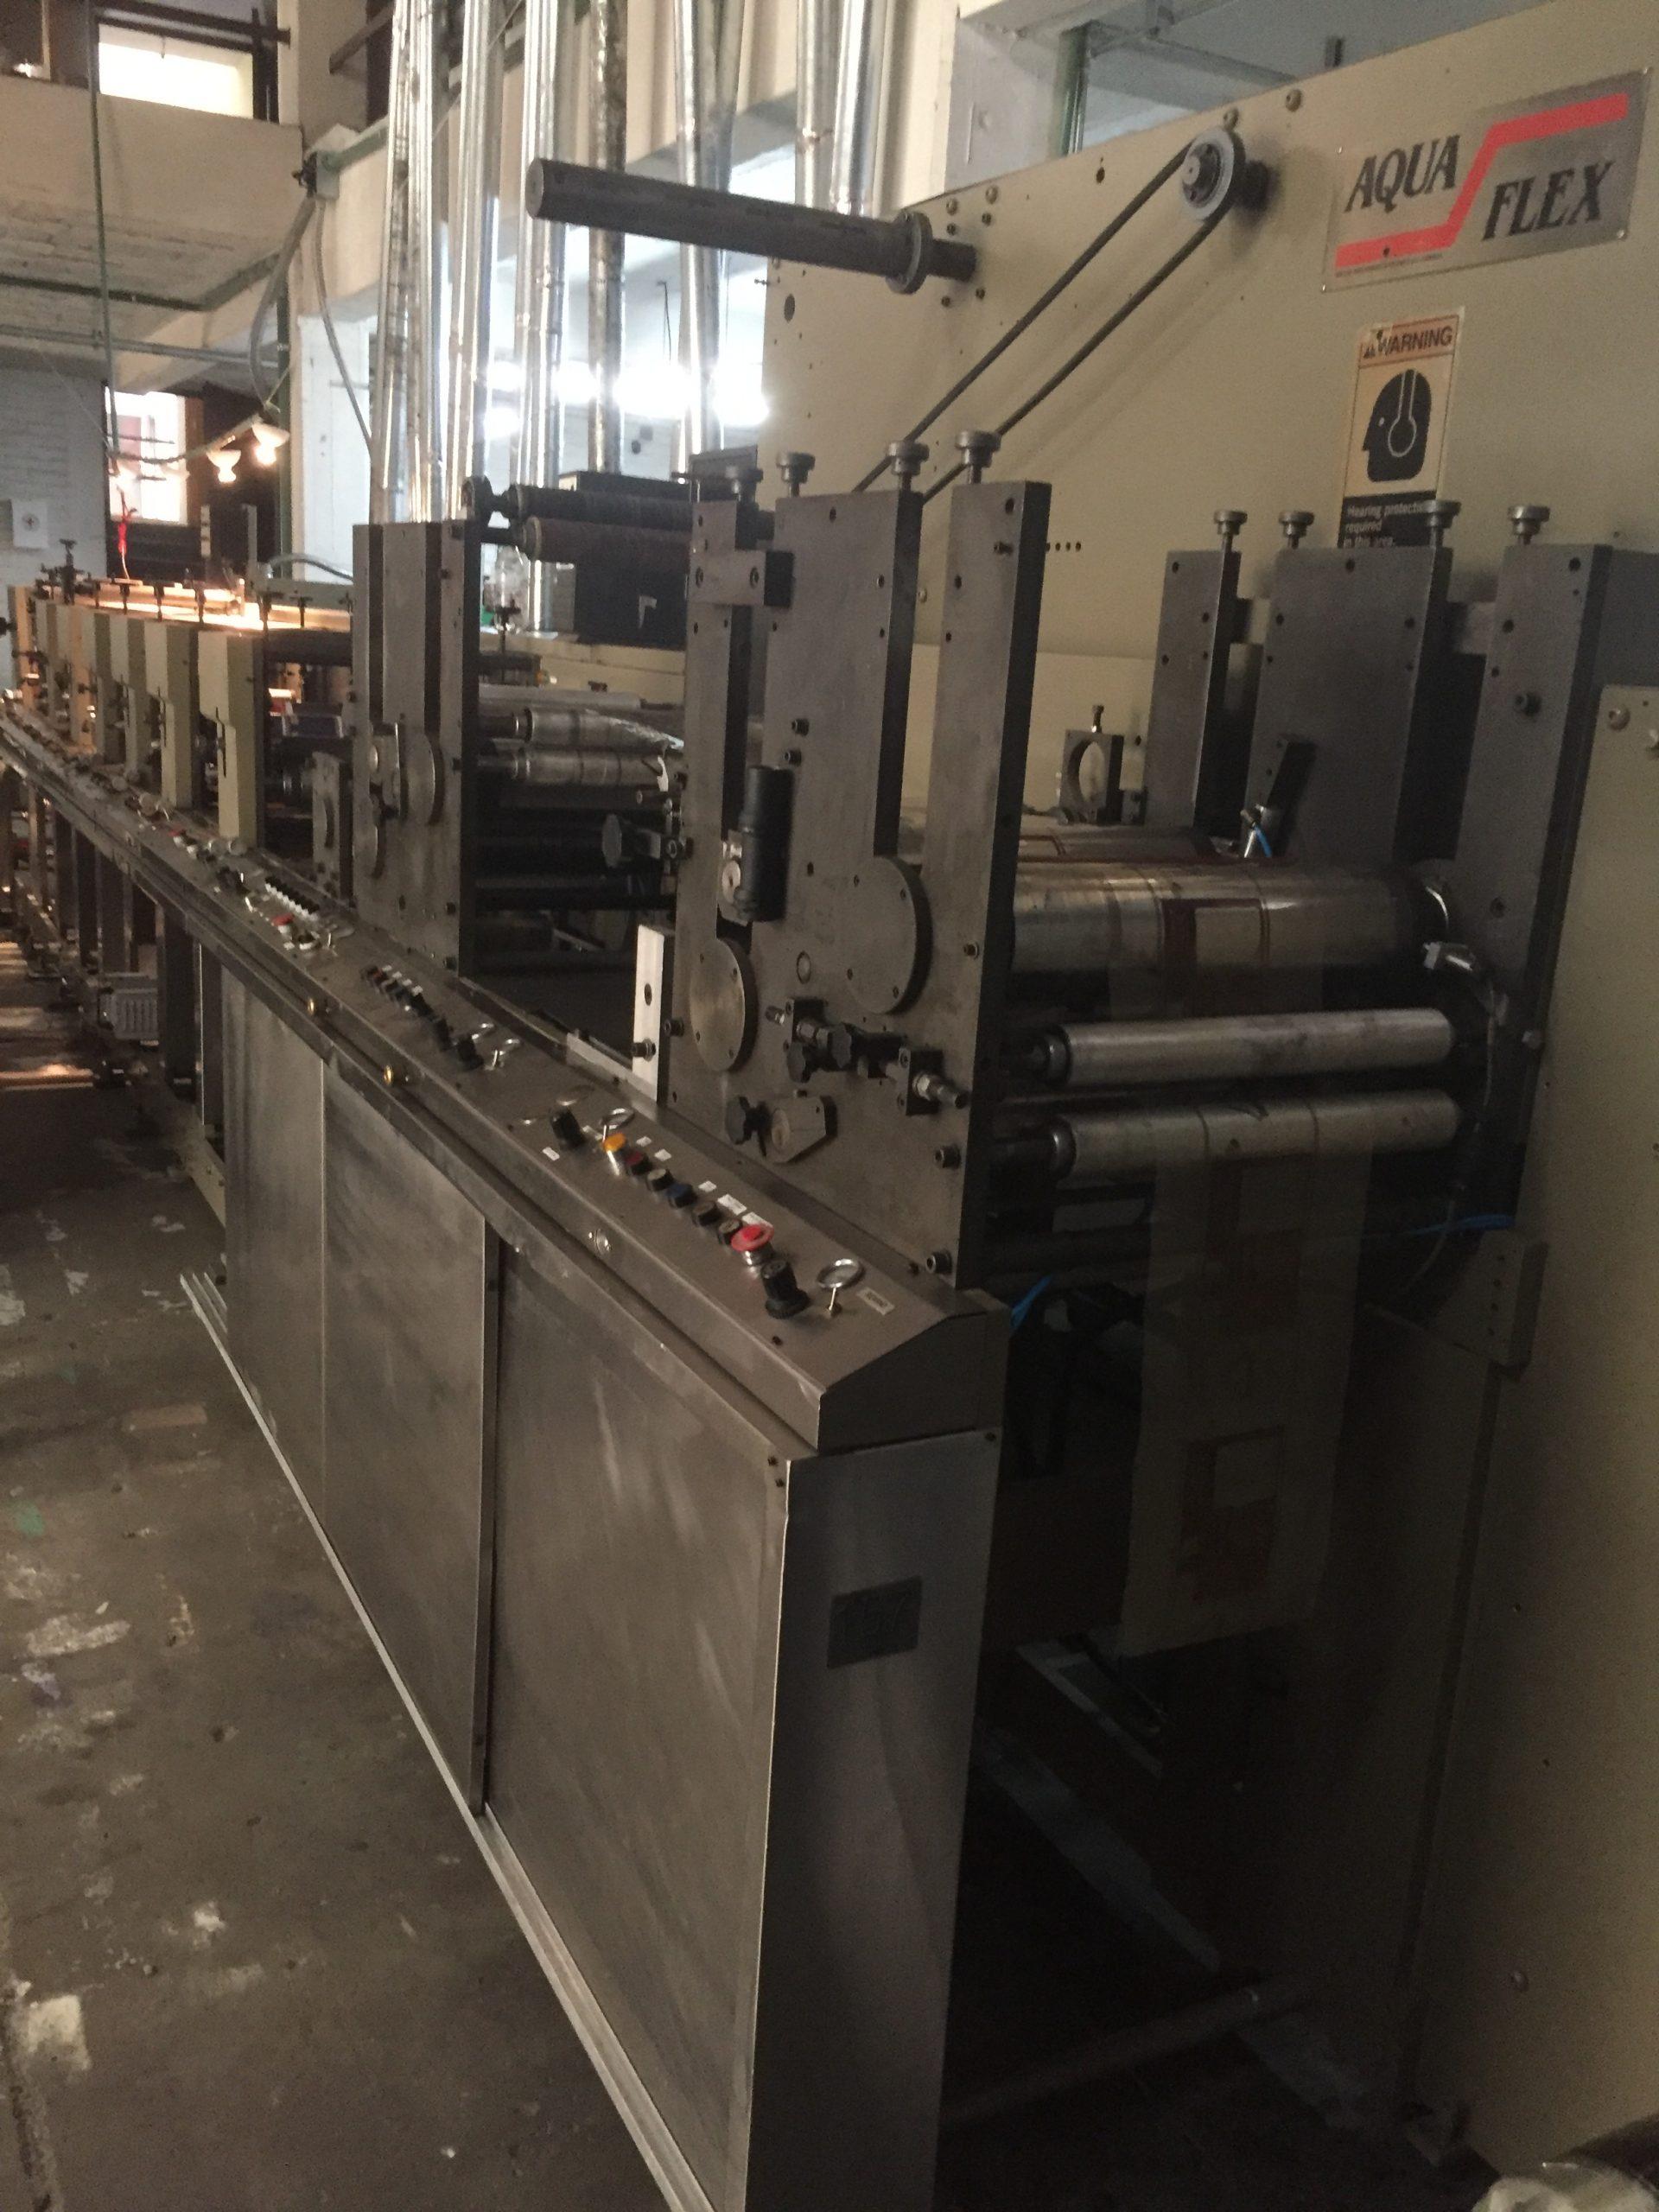 Aquaflex - Used Flexo Printing Presses and Used Flexographic Equipment-1